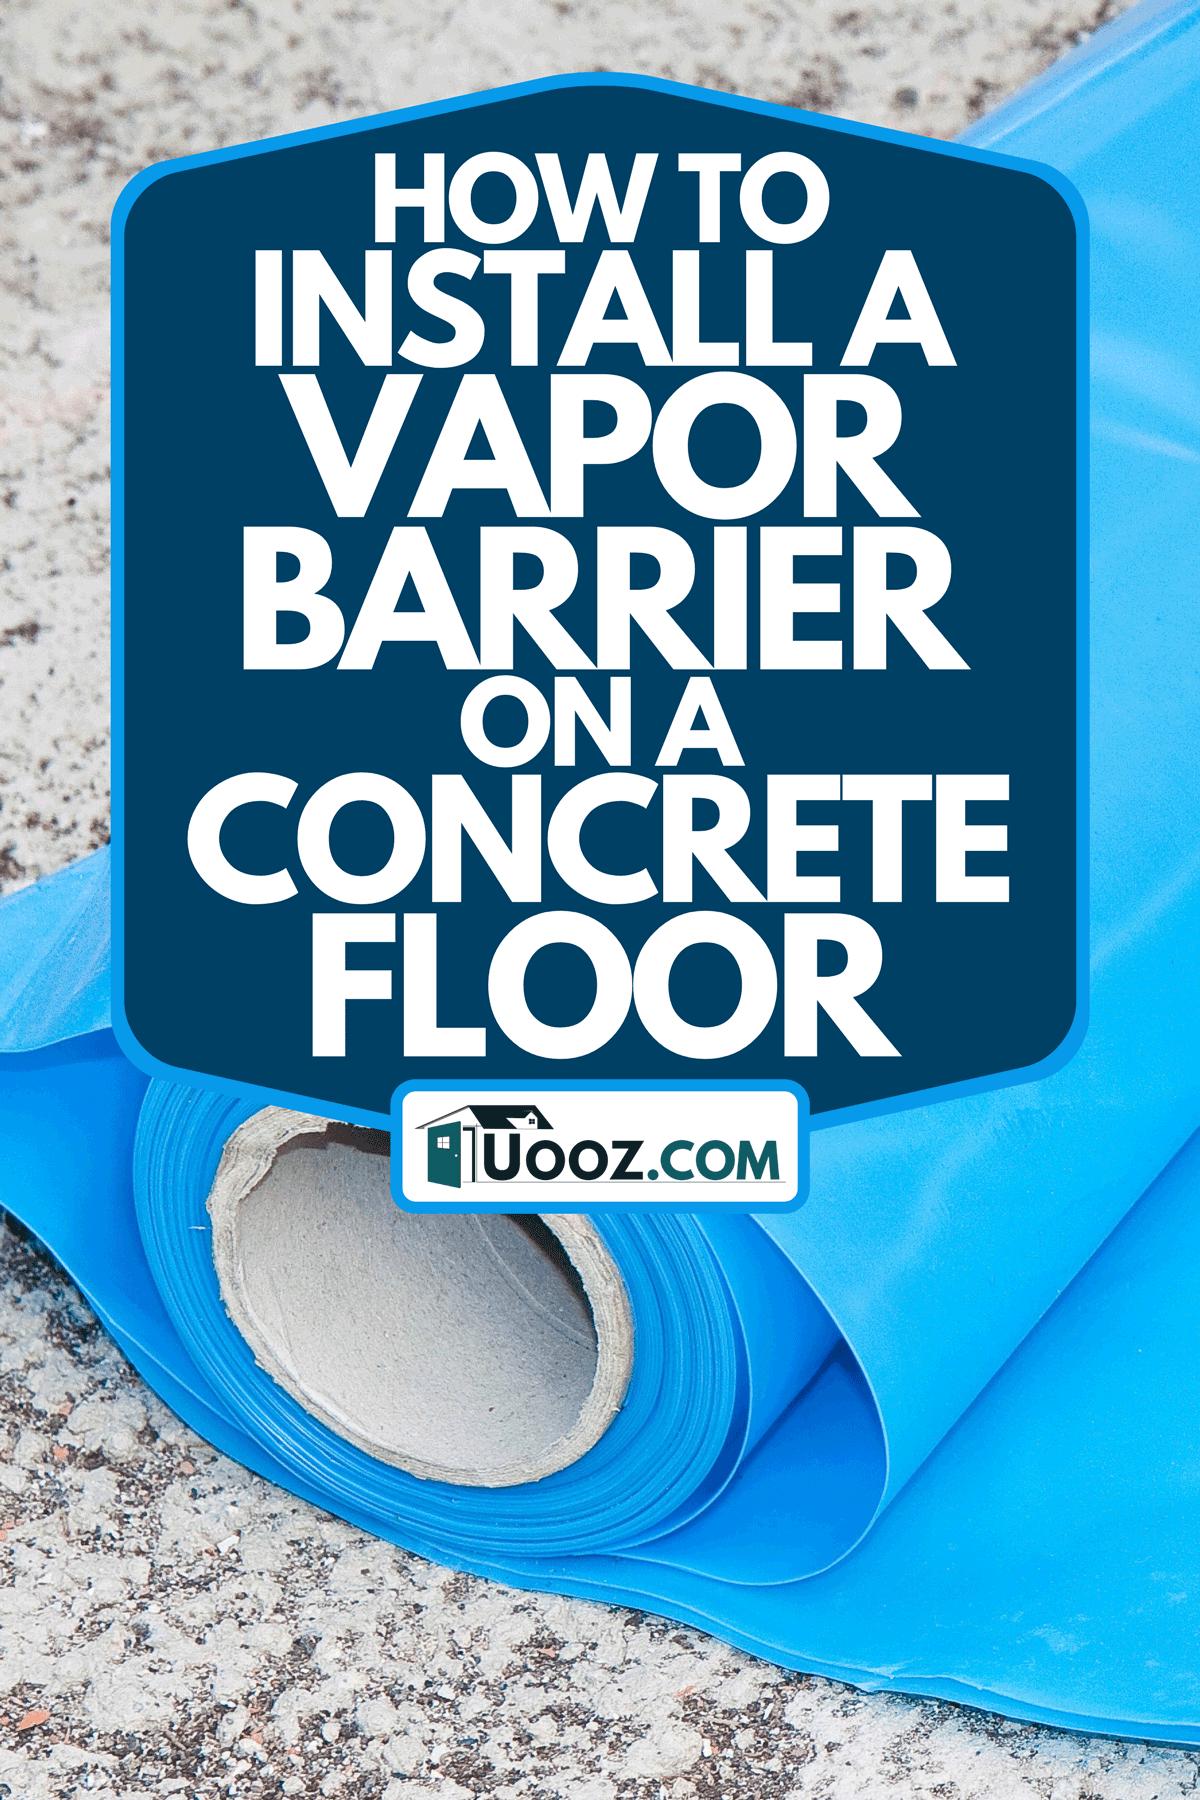 A polyethylene protection vapor barrier on concrete floor, How To Install A Vapor Barrier On A Concrete Floor